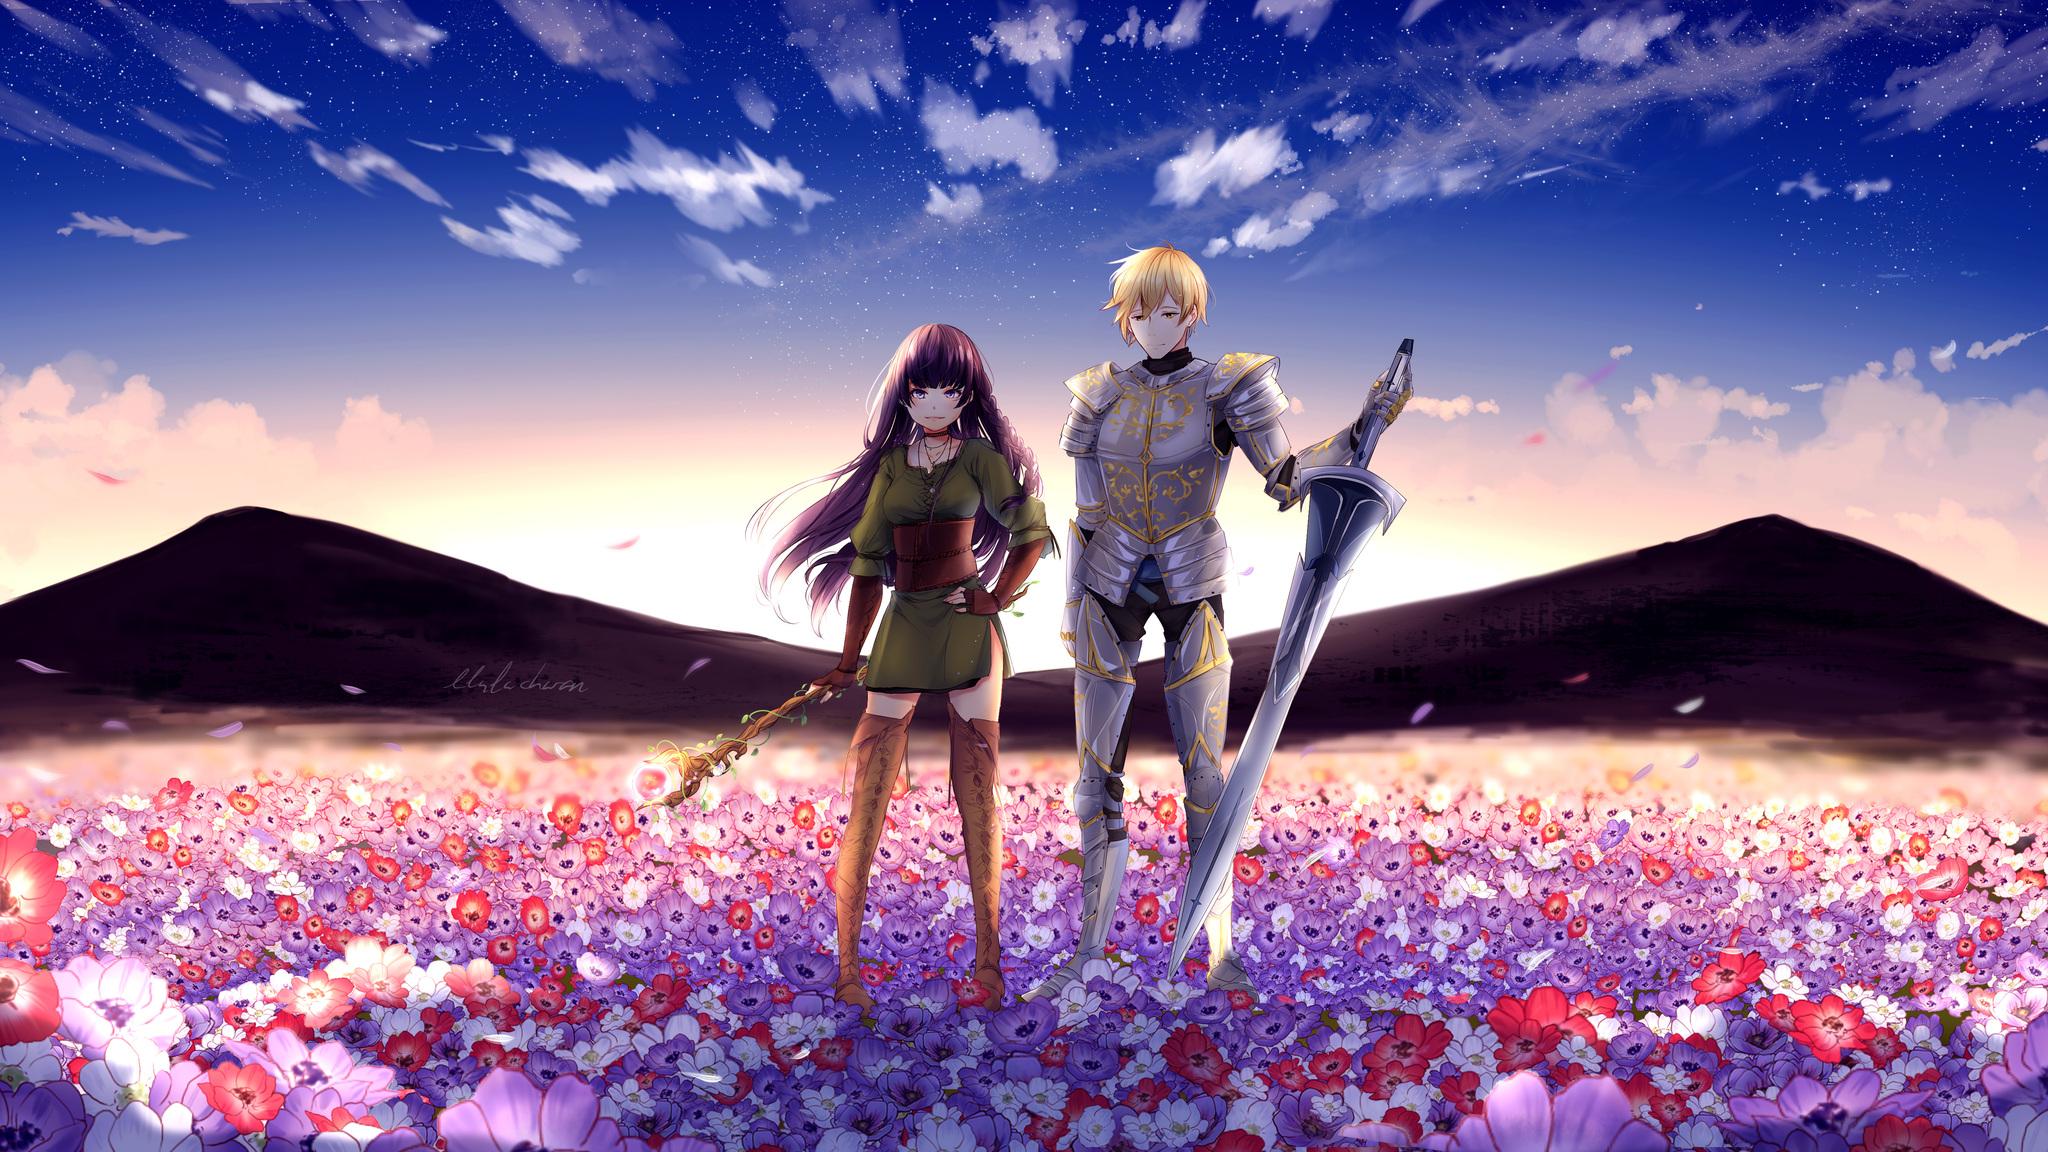 2048x1152 Manga And Anime 2048x1152 Resolution Hd 4k